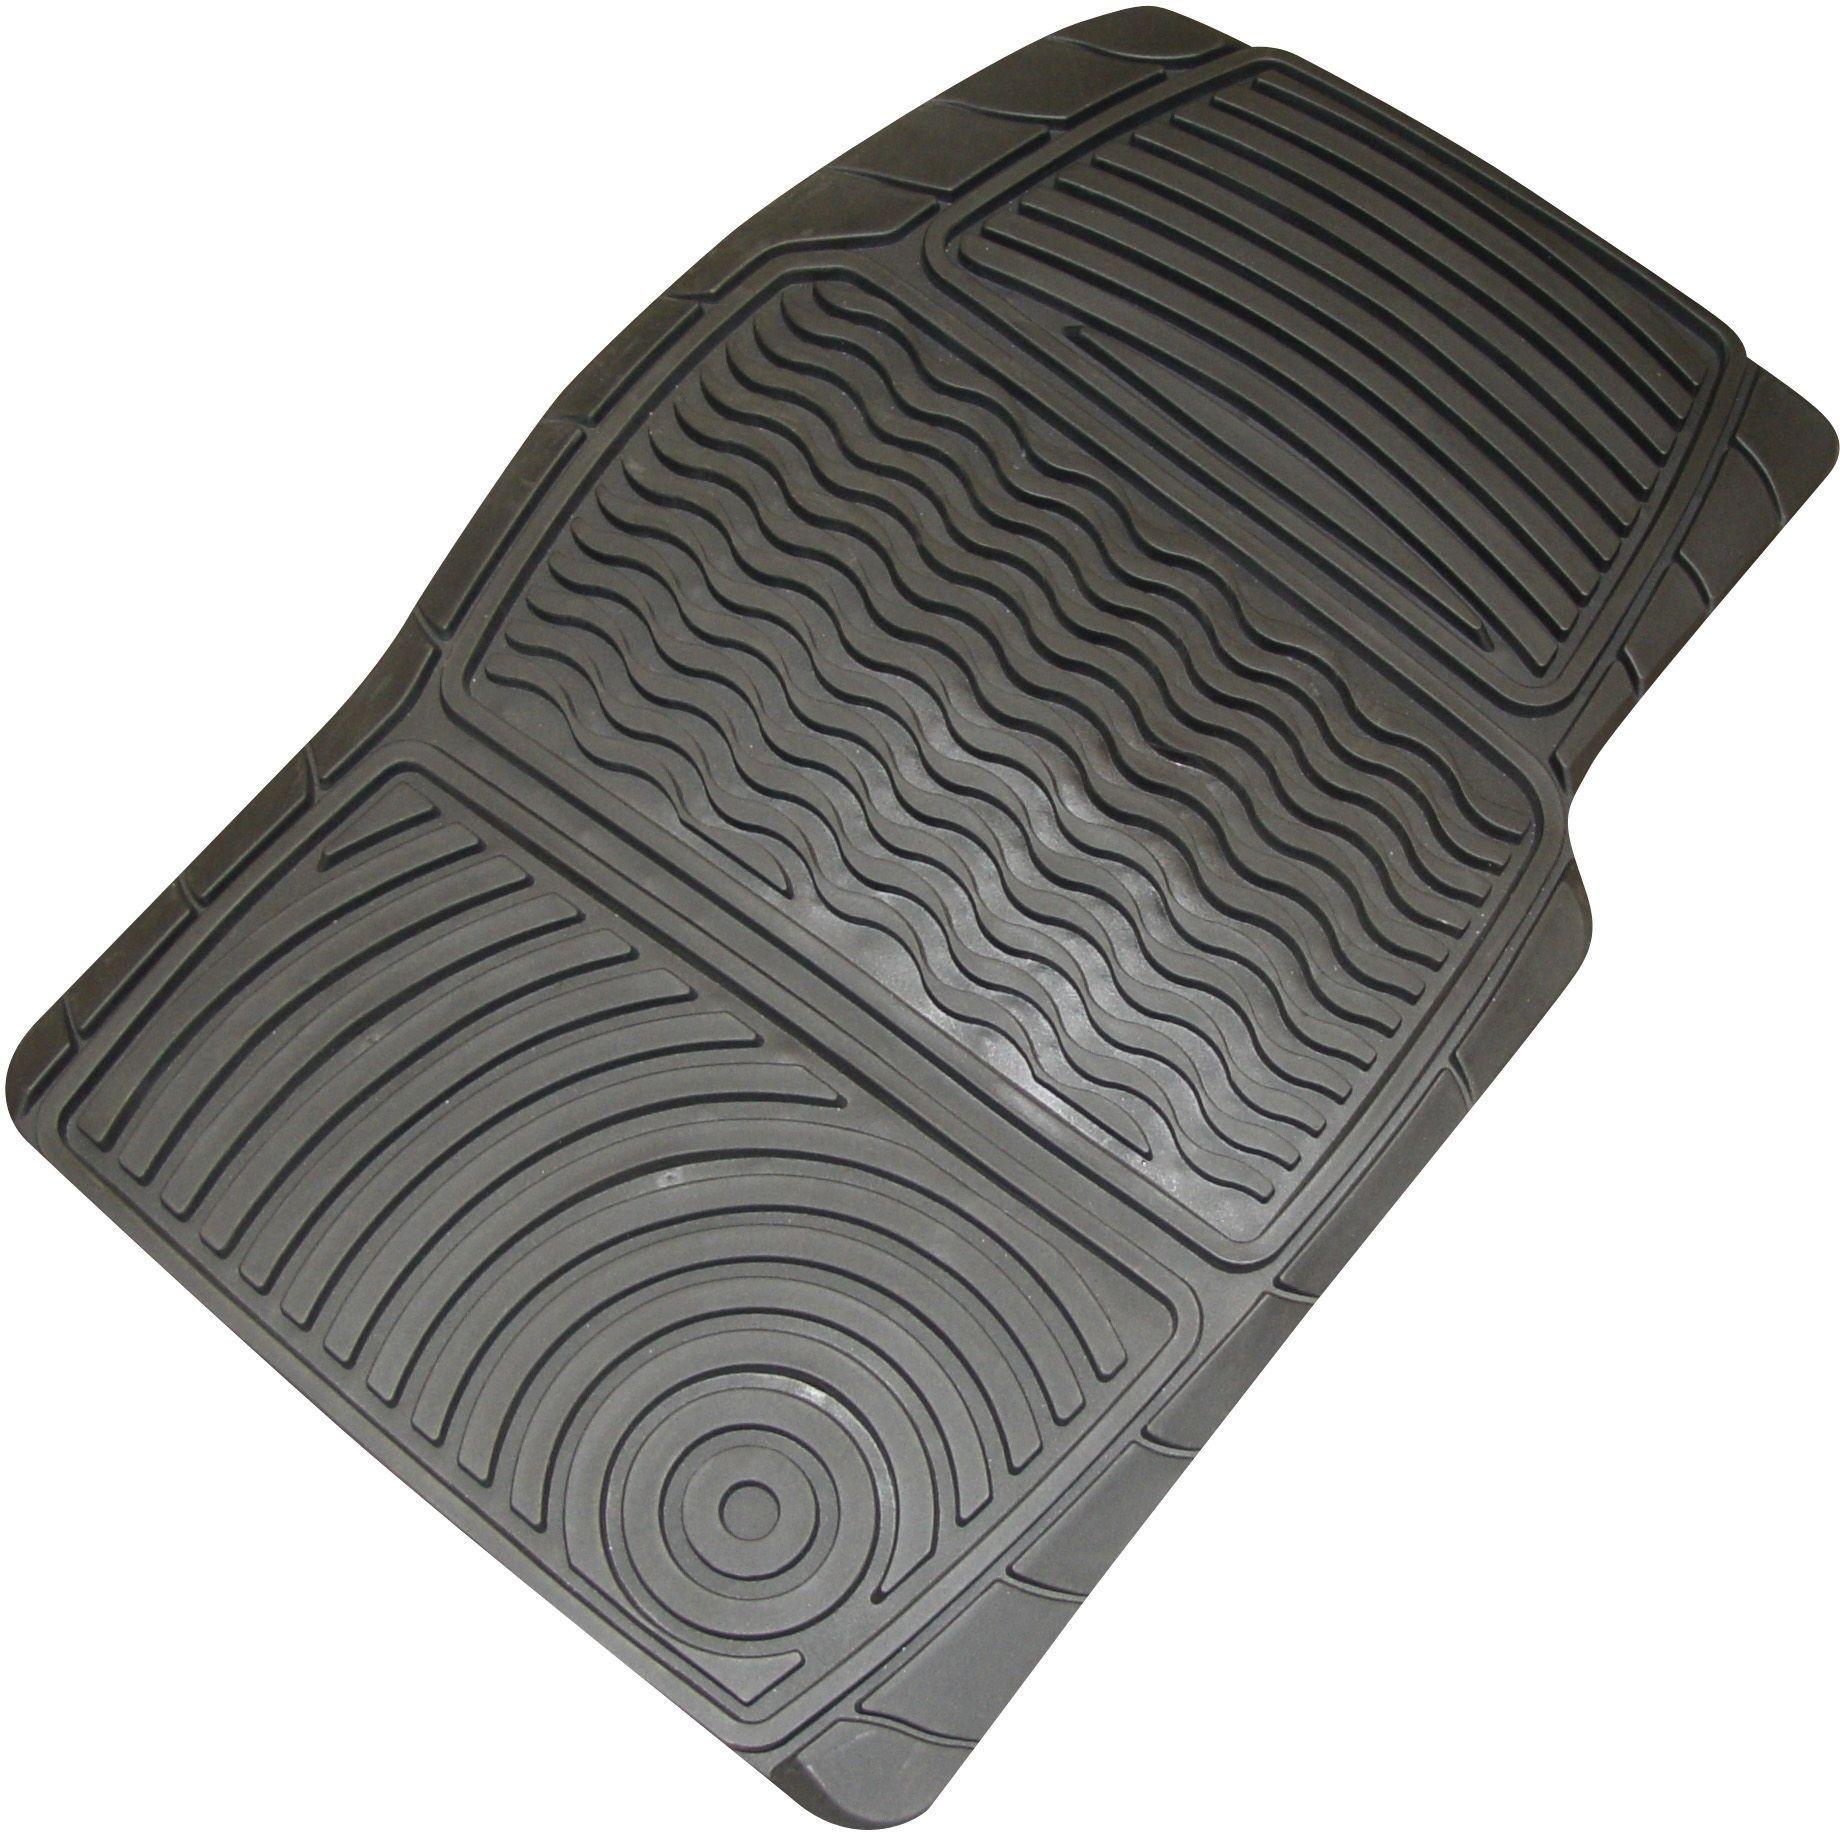 Floor mats xsara picasso - Cosmos Primo All Weather 4 Piece Car Mat